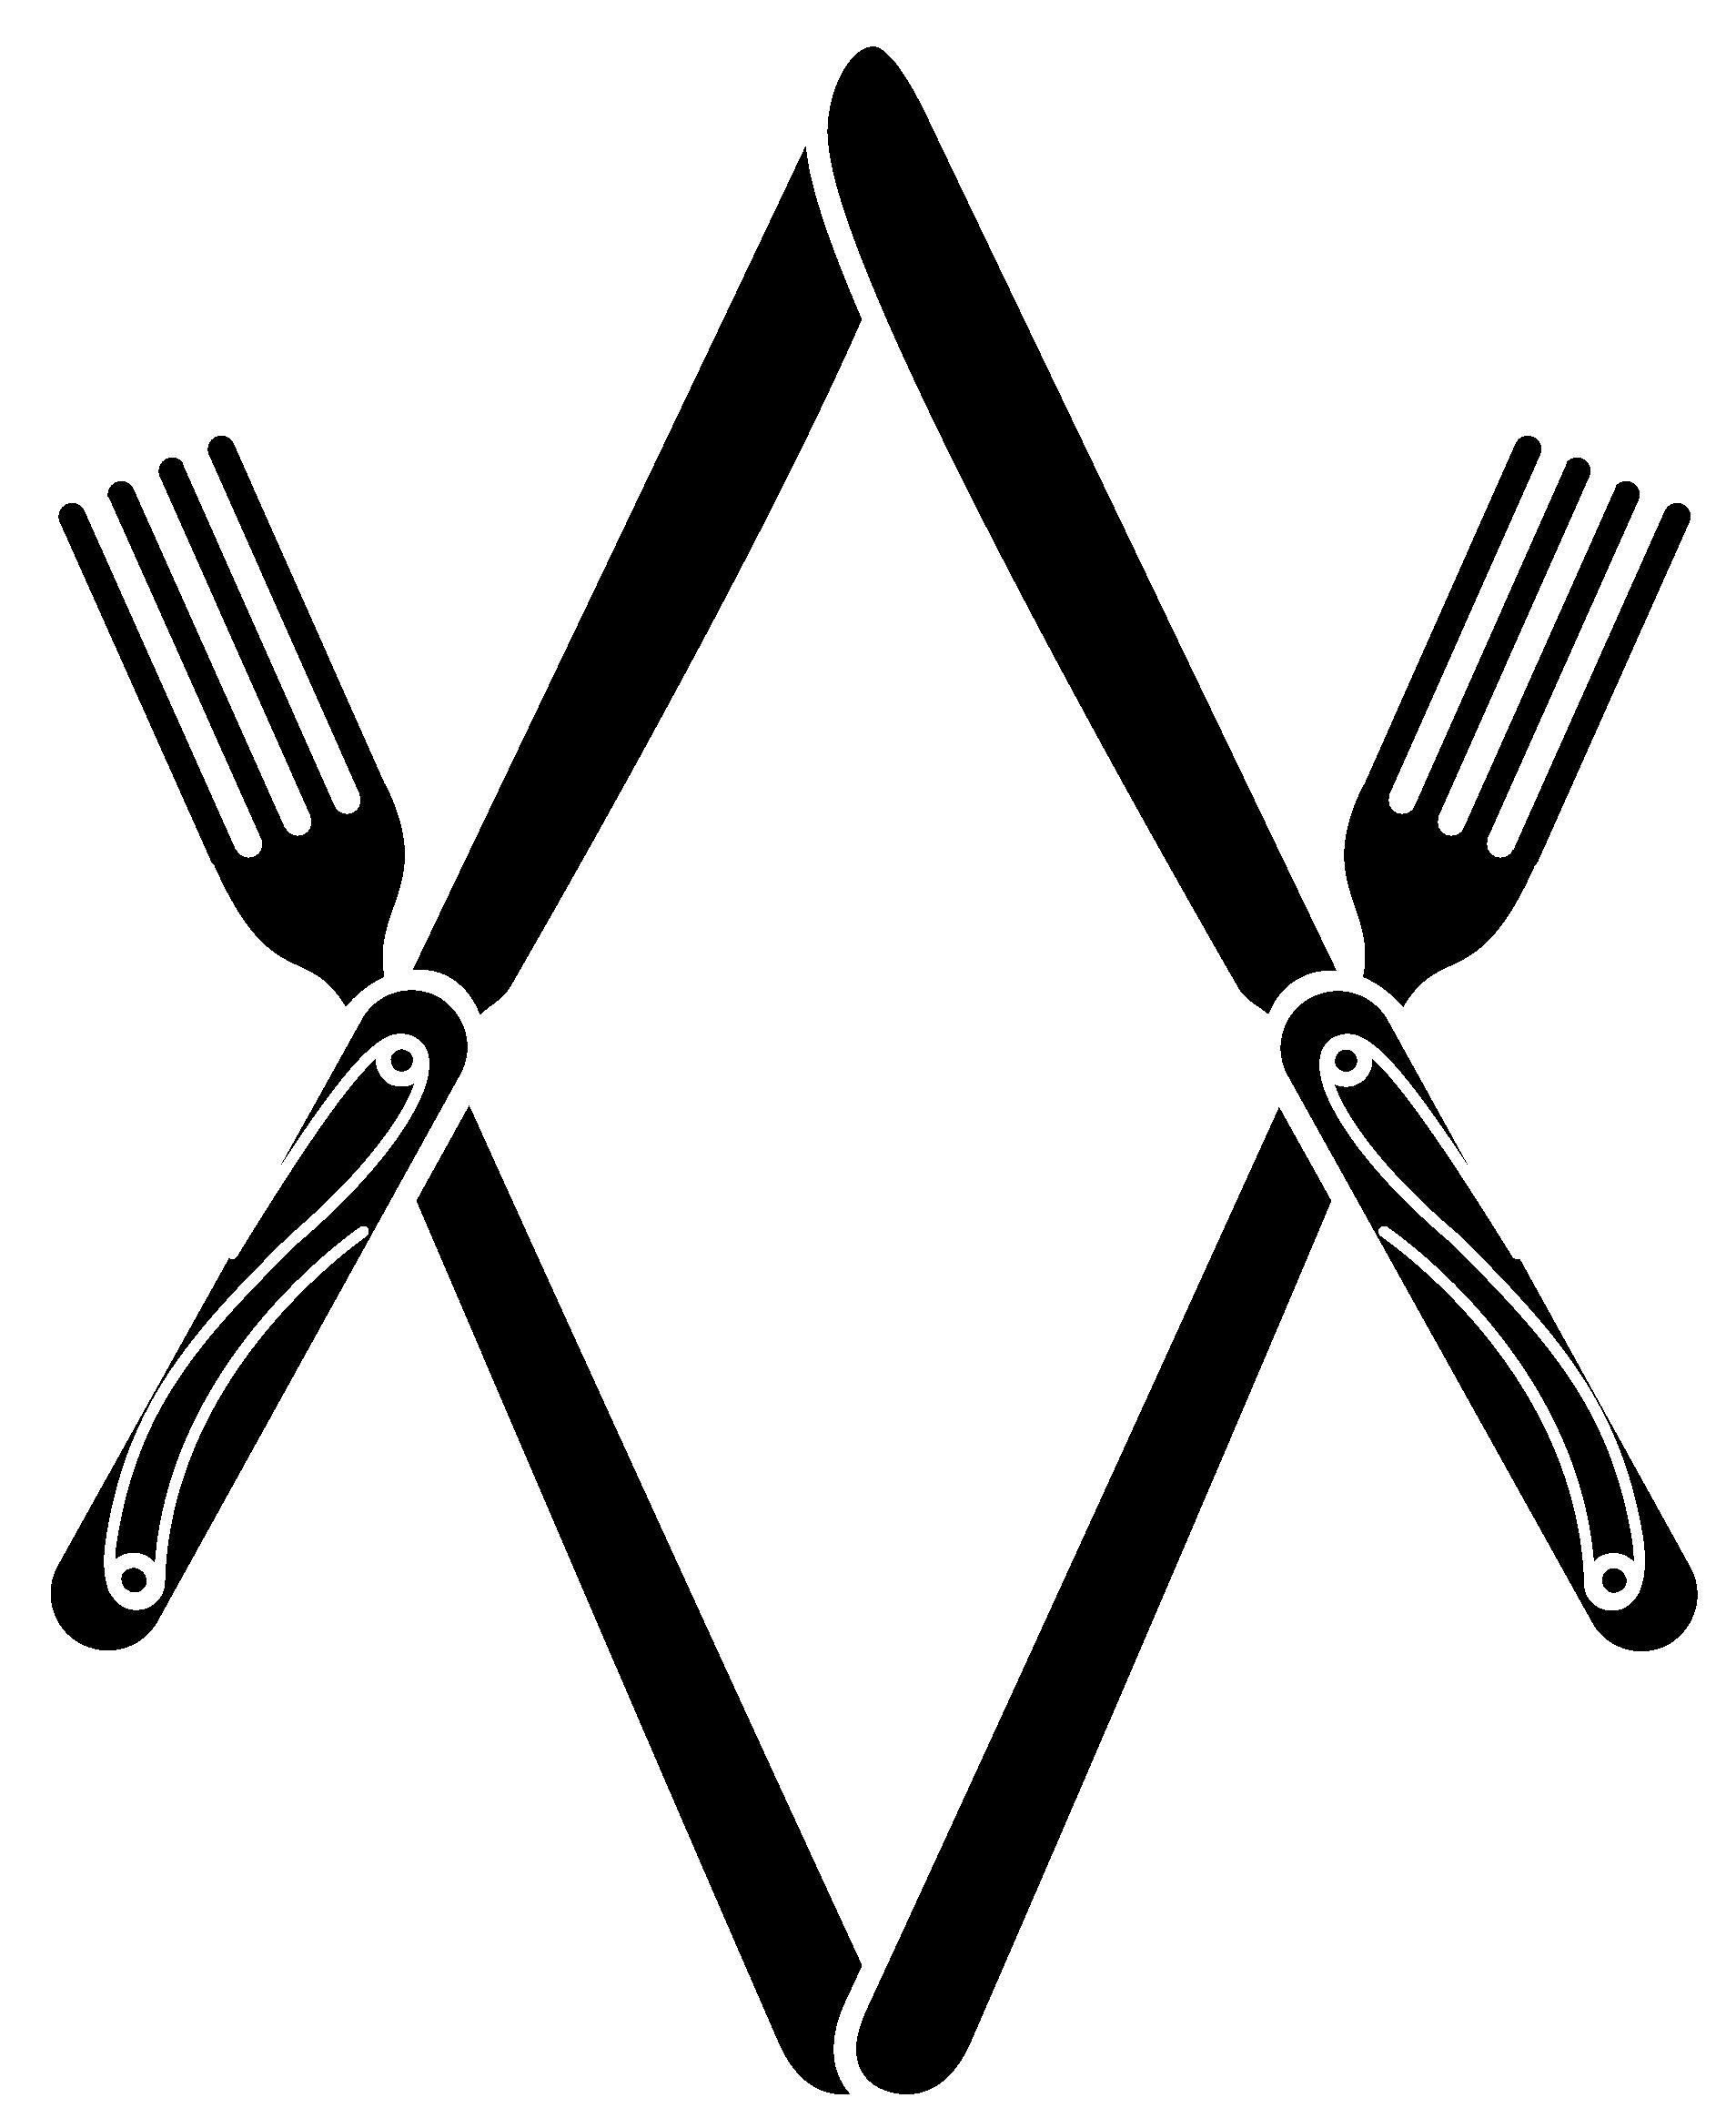 Masonic Clipart | Free download best Masonic Clipart on ...